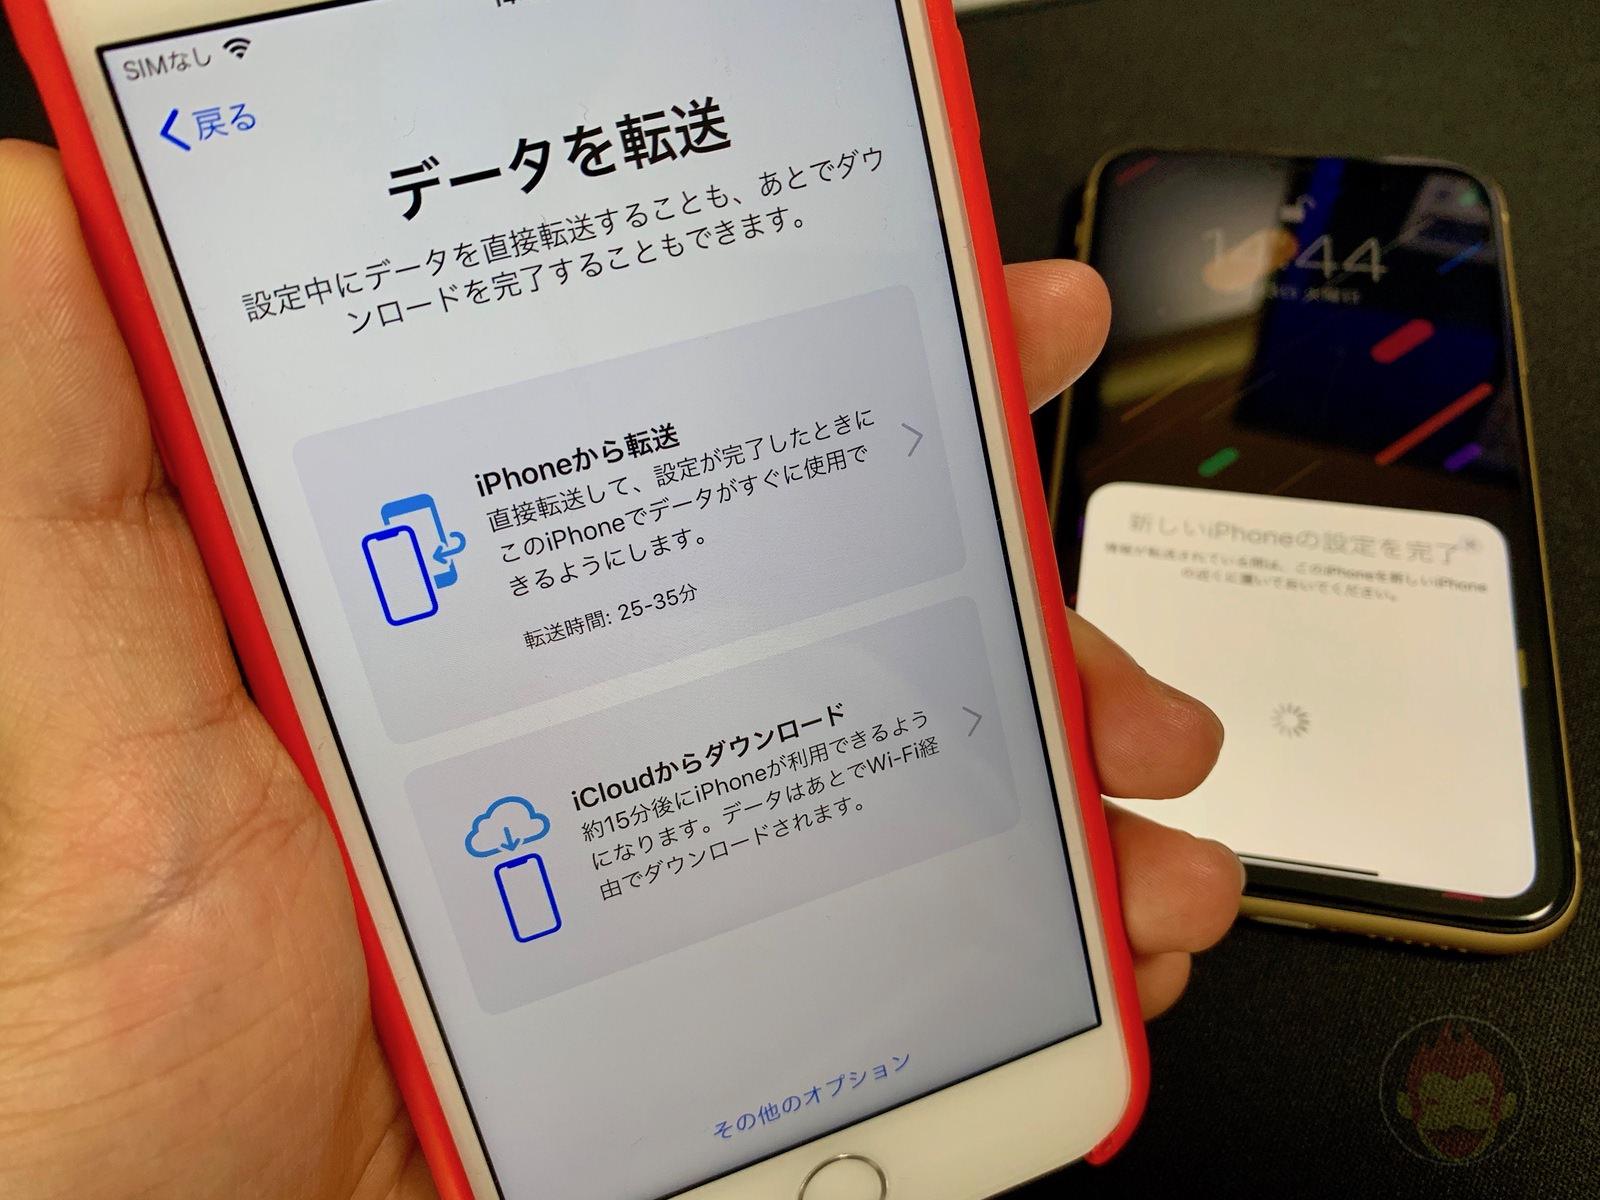 「iPhoneからデータ転送」を選択 写真元:gori.me